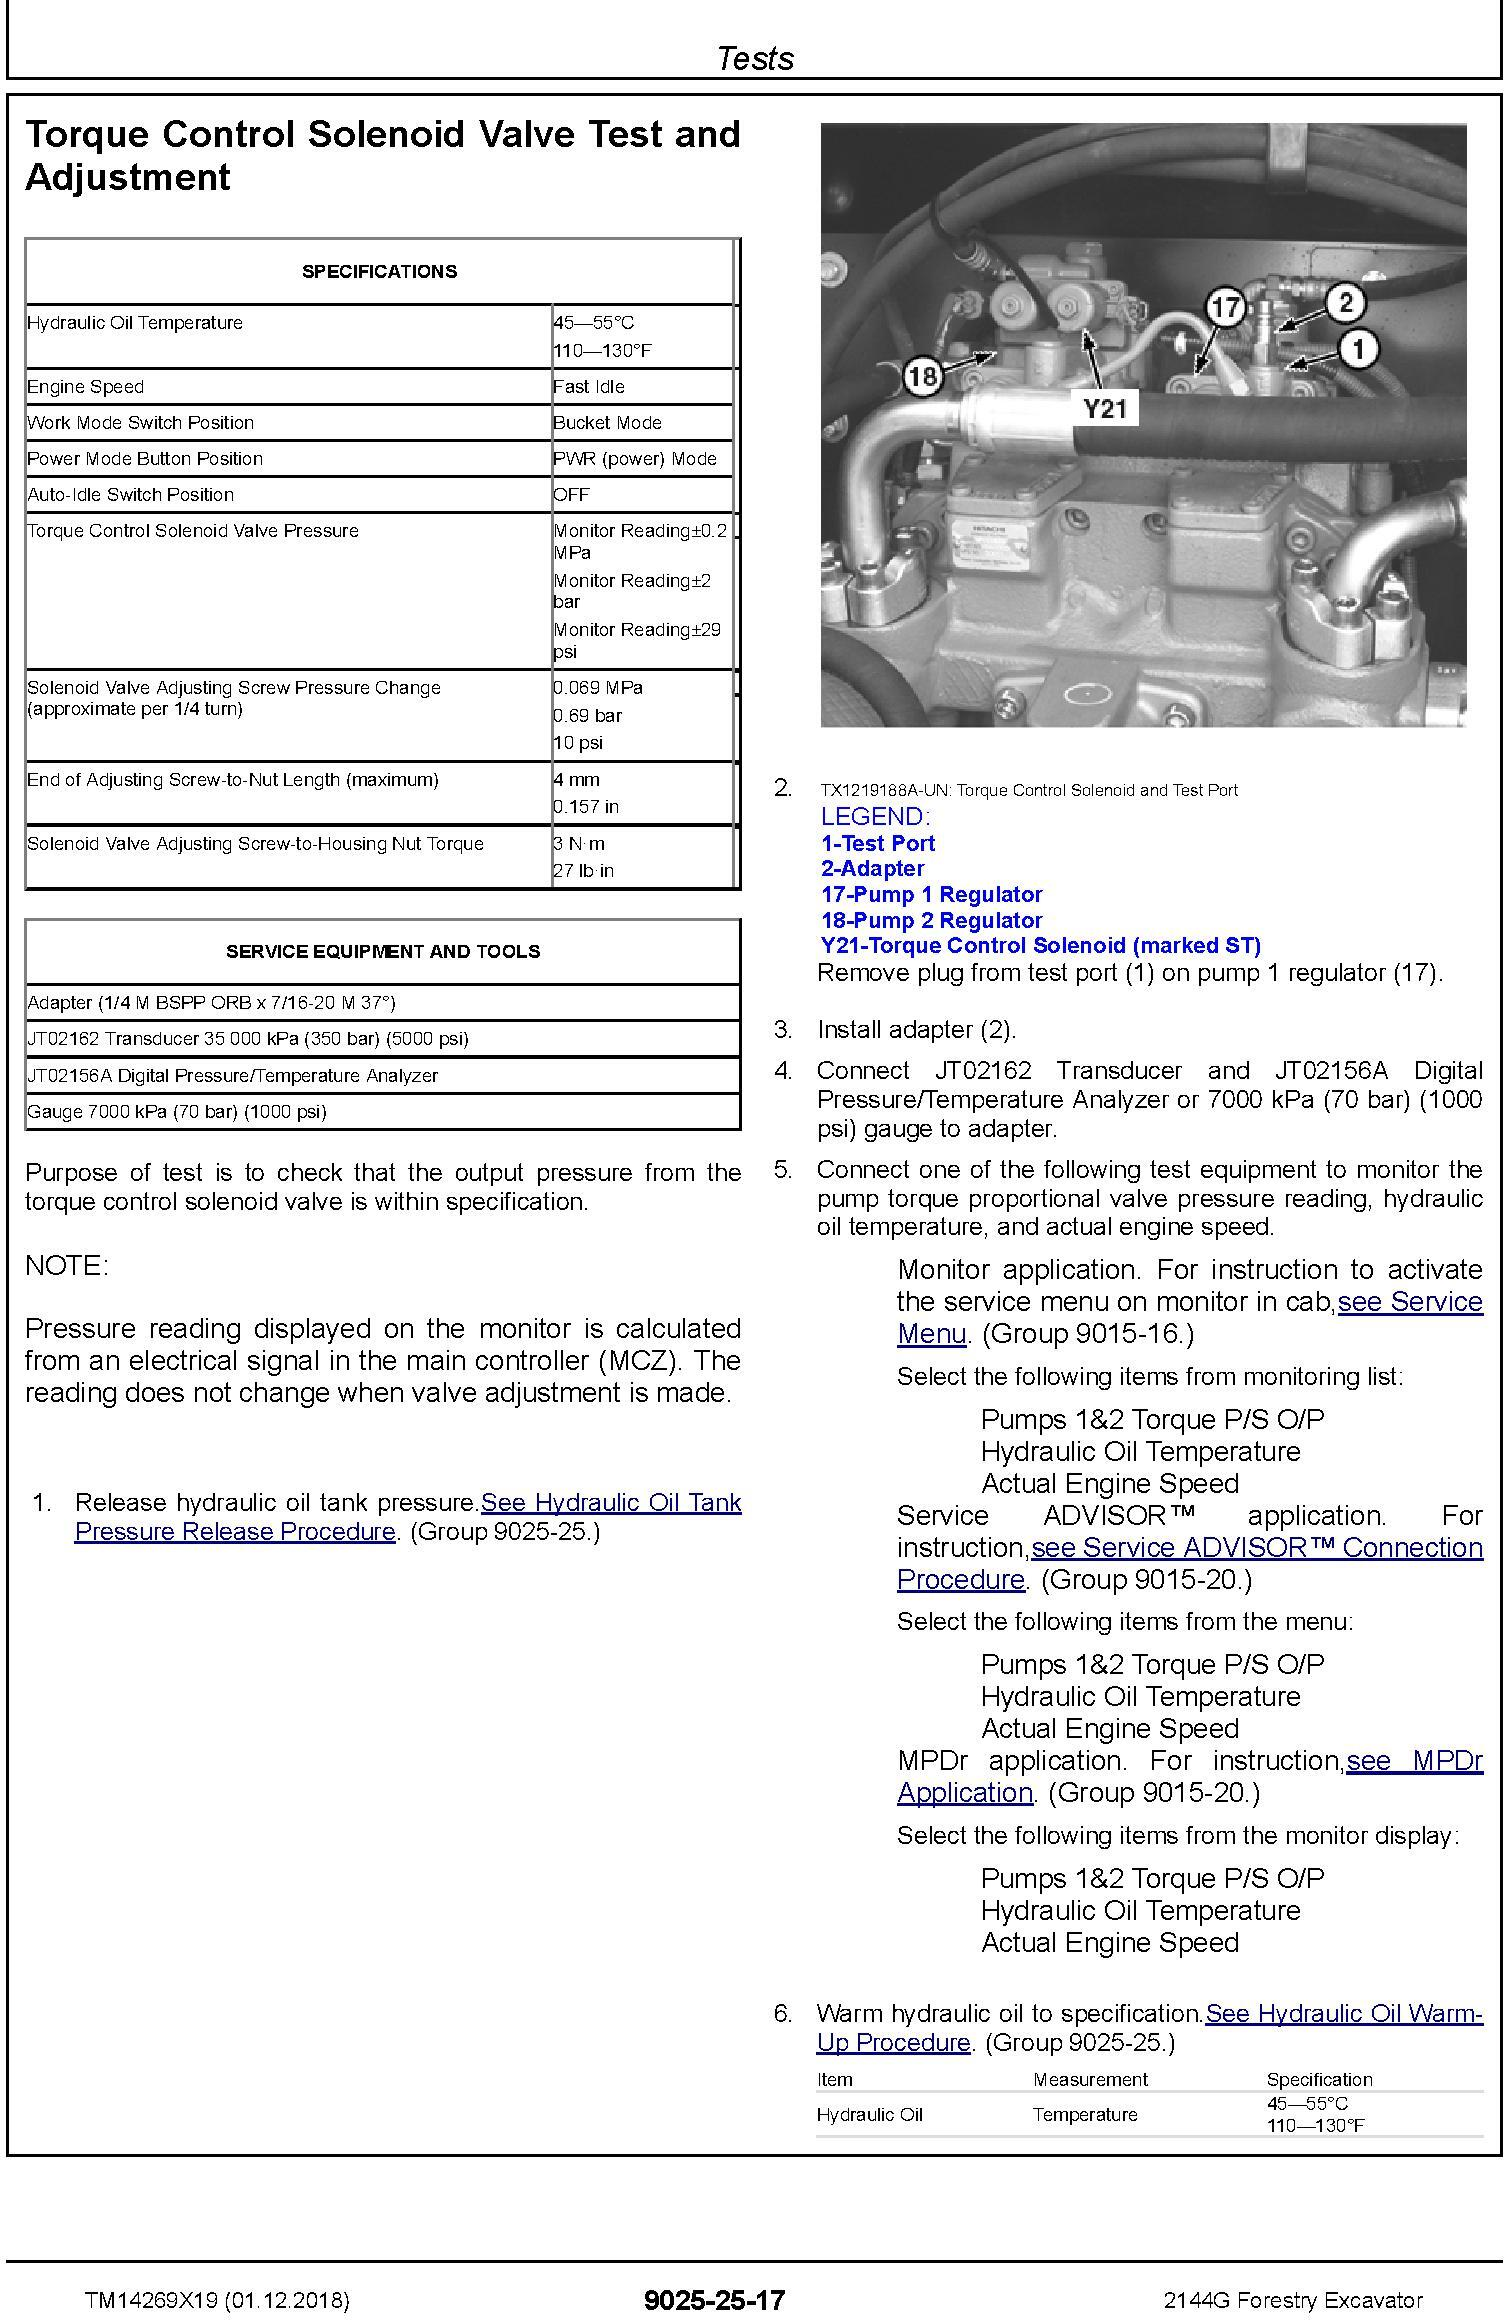 John Deere 2144G (SN. D210001-) Forestry Excavator Operation & Test Technical Manual (TM14269X19) - 3